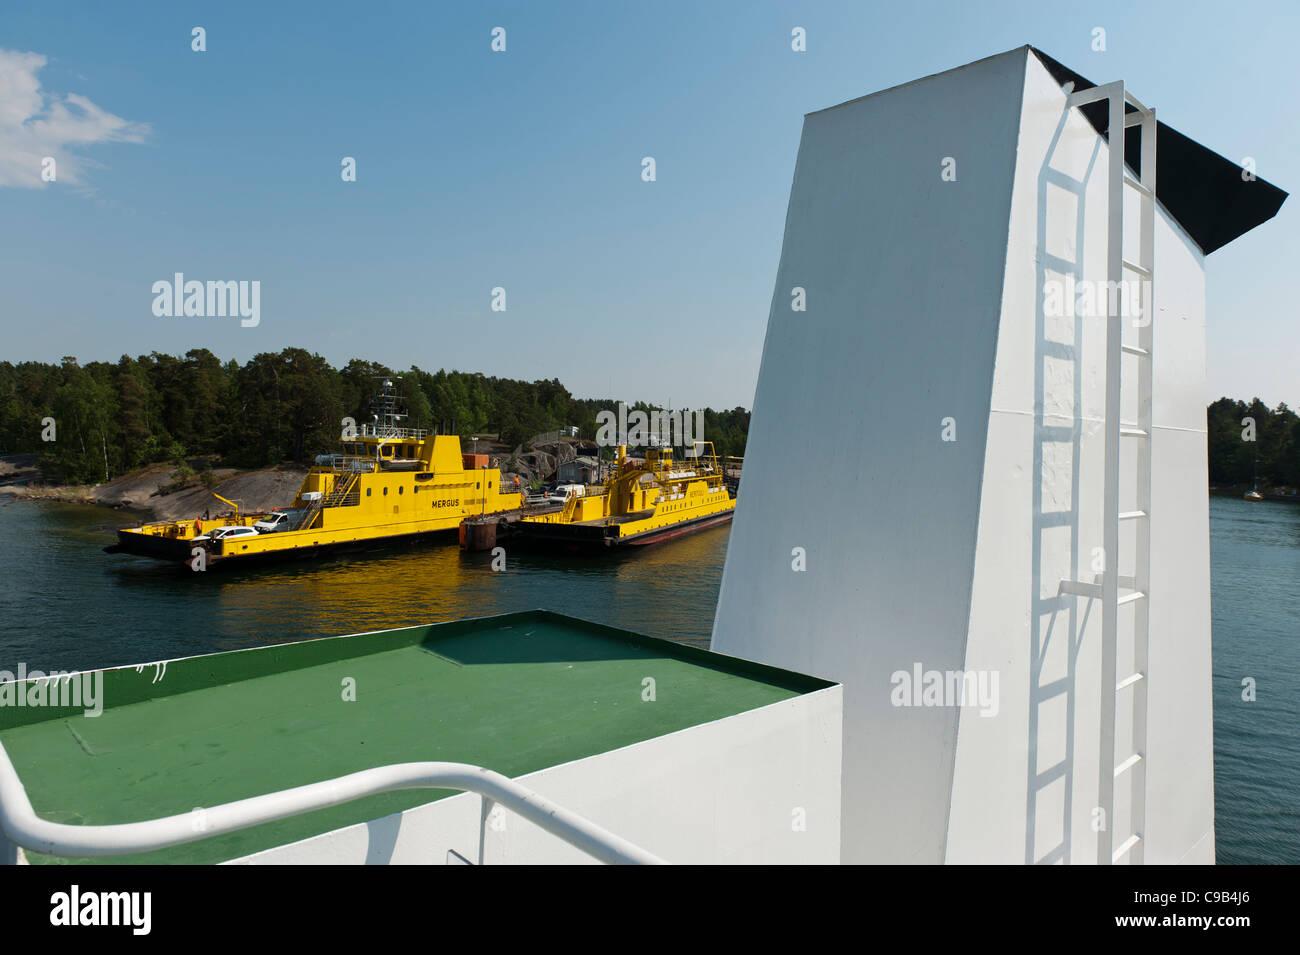 Archipelago ferries, Galtby, Korppoo Island, Turku archipelago, Finland - Stock Image